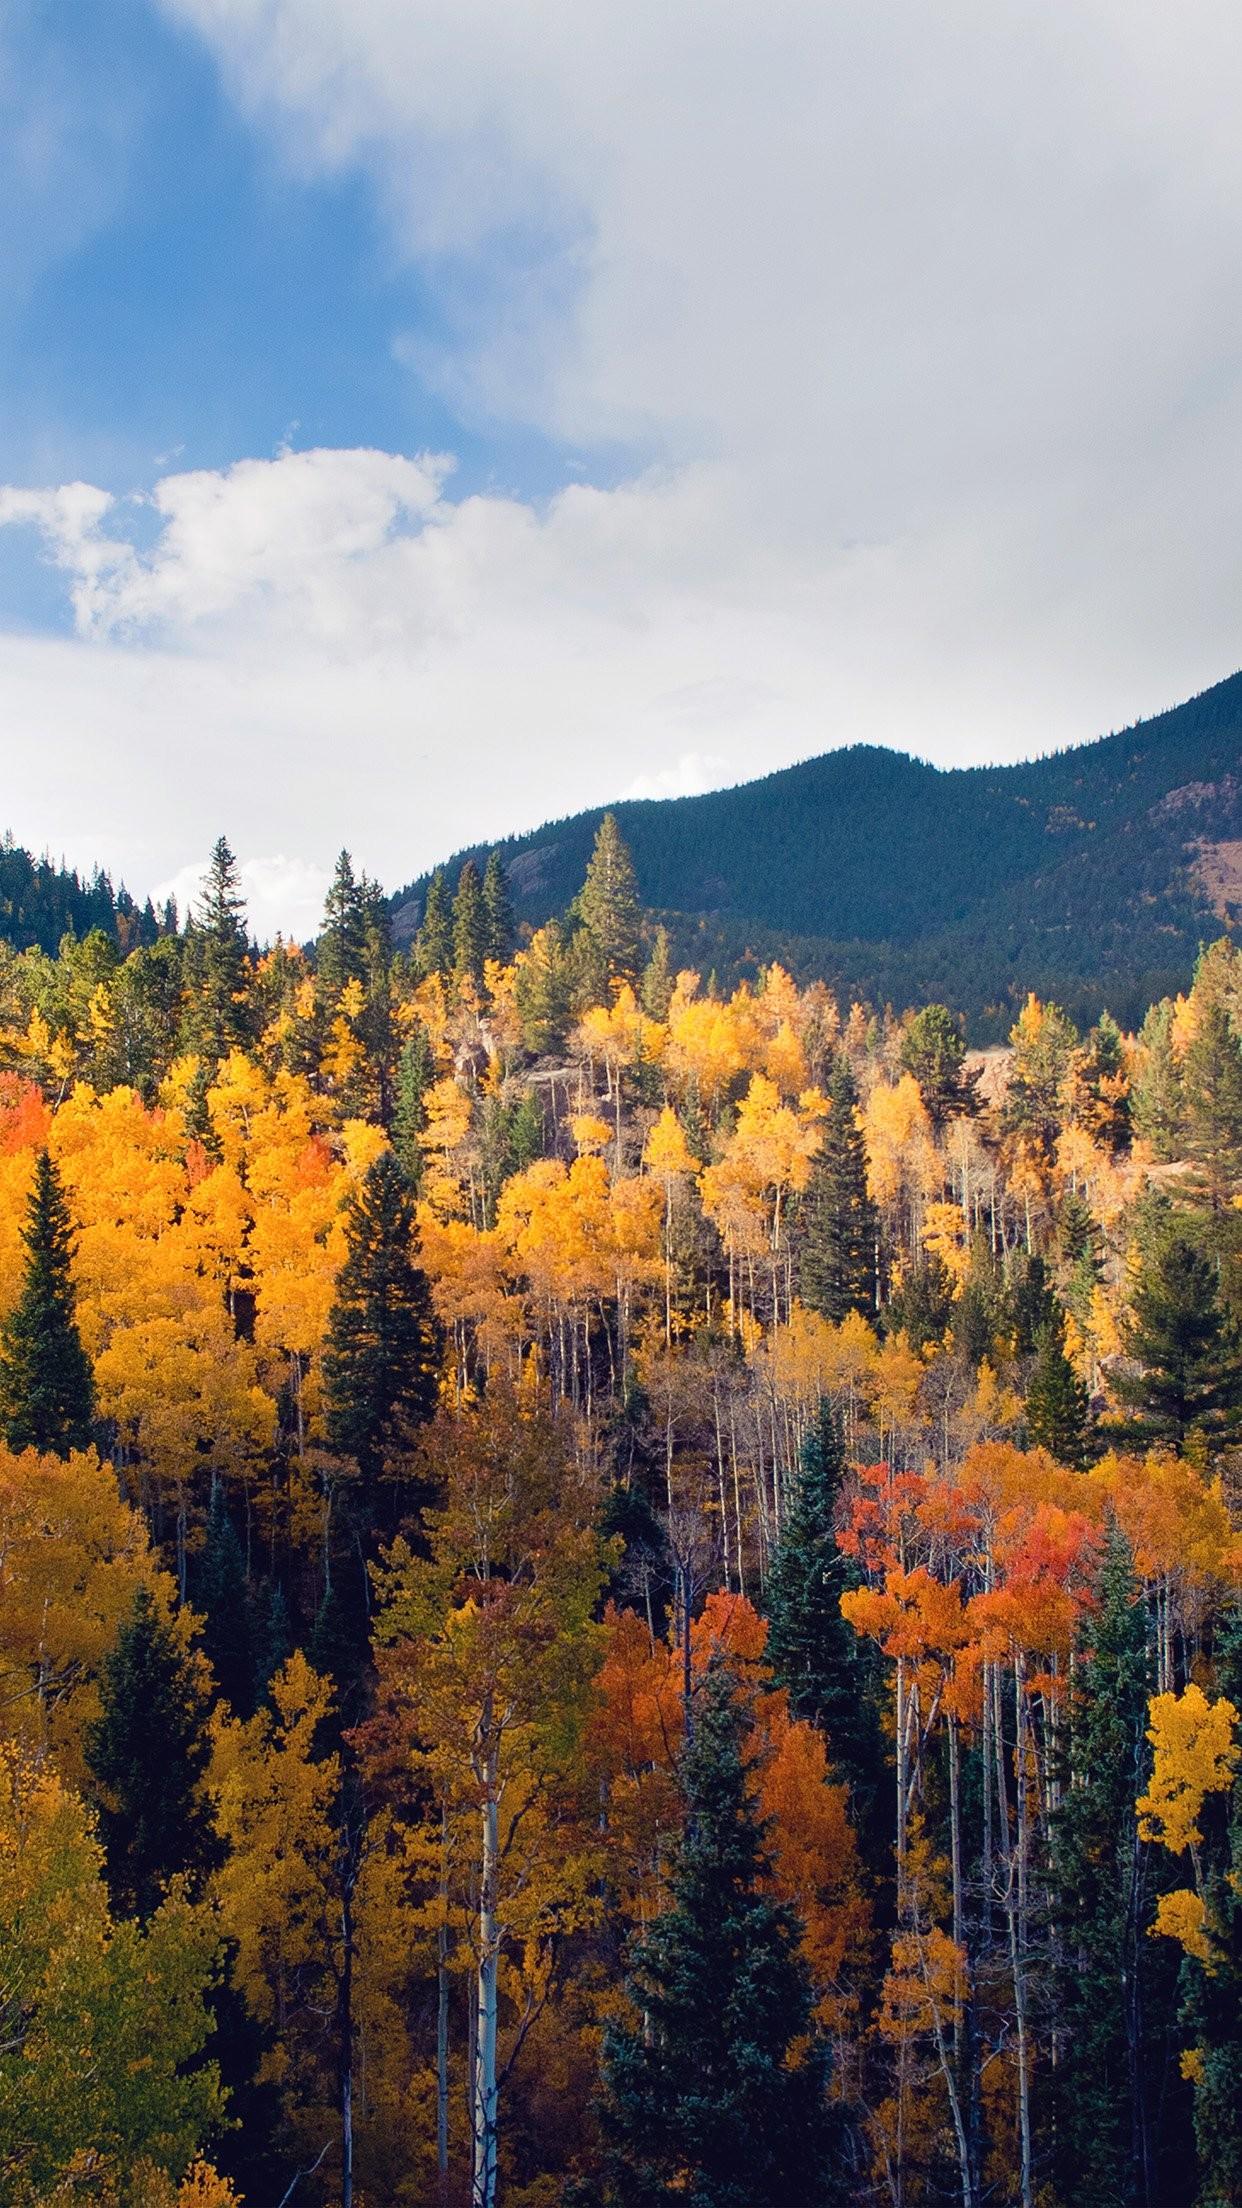 Autumn Splendor. [Desktop wallpaper 1440×900] | Landscape Desktop Wp's |  Pinterest